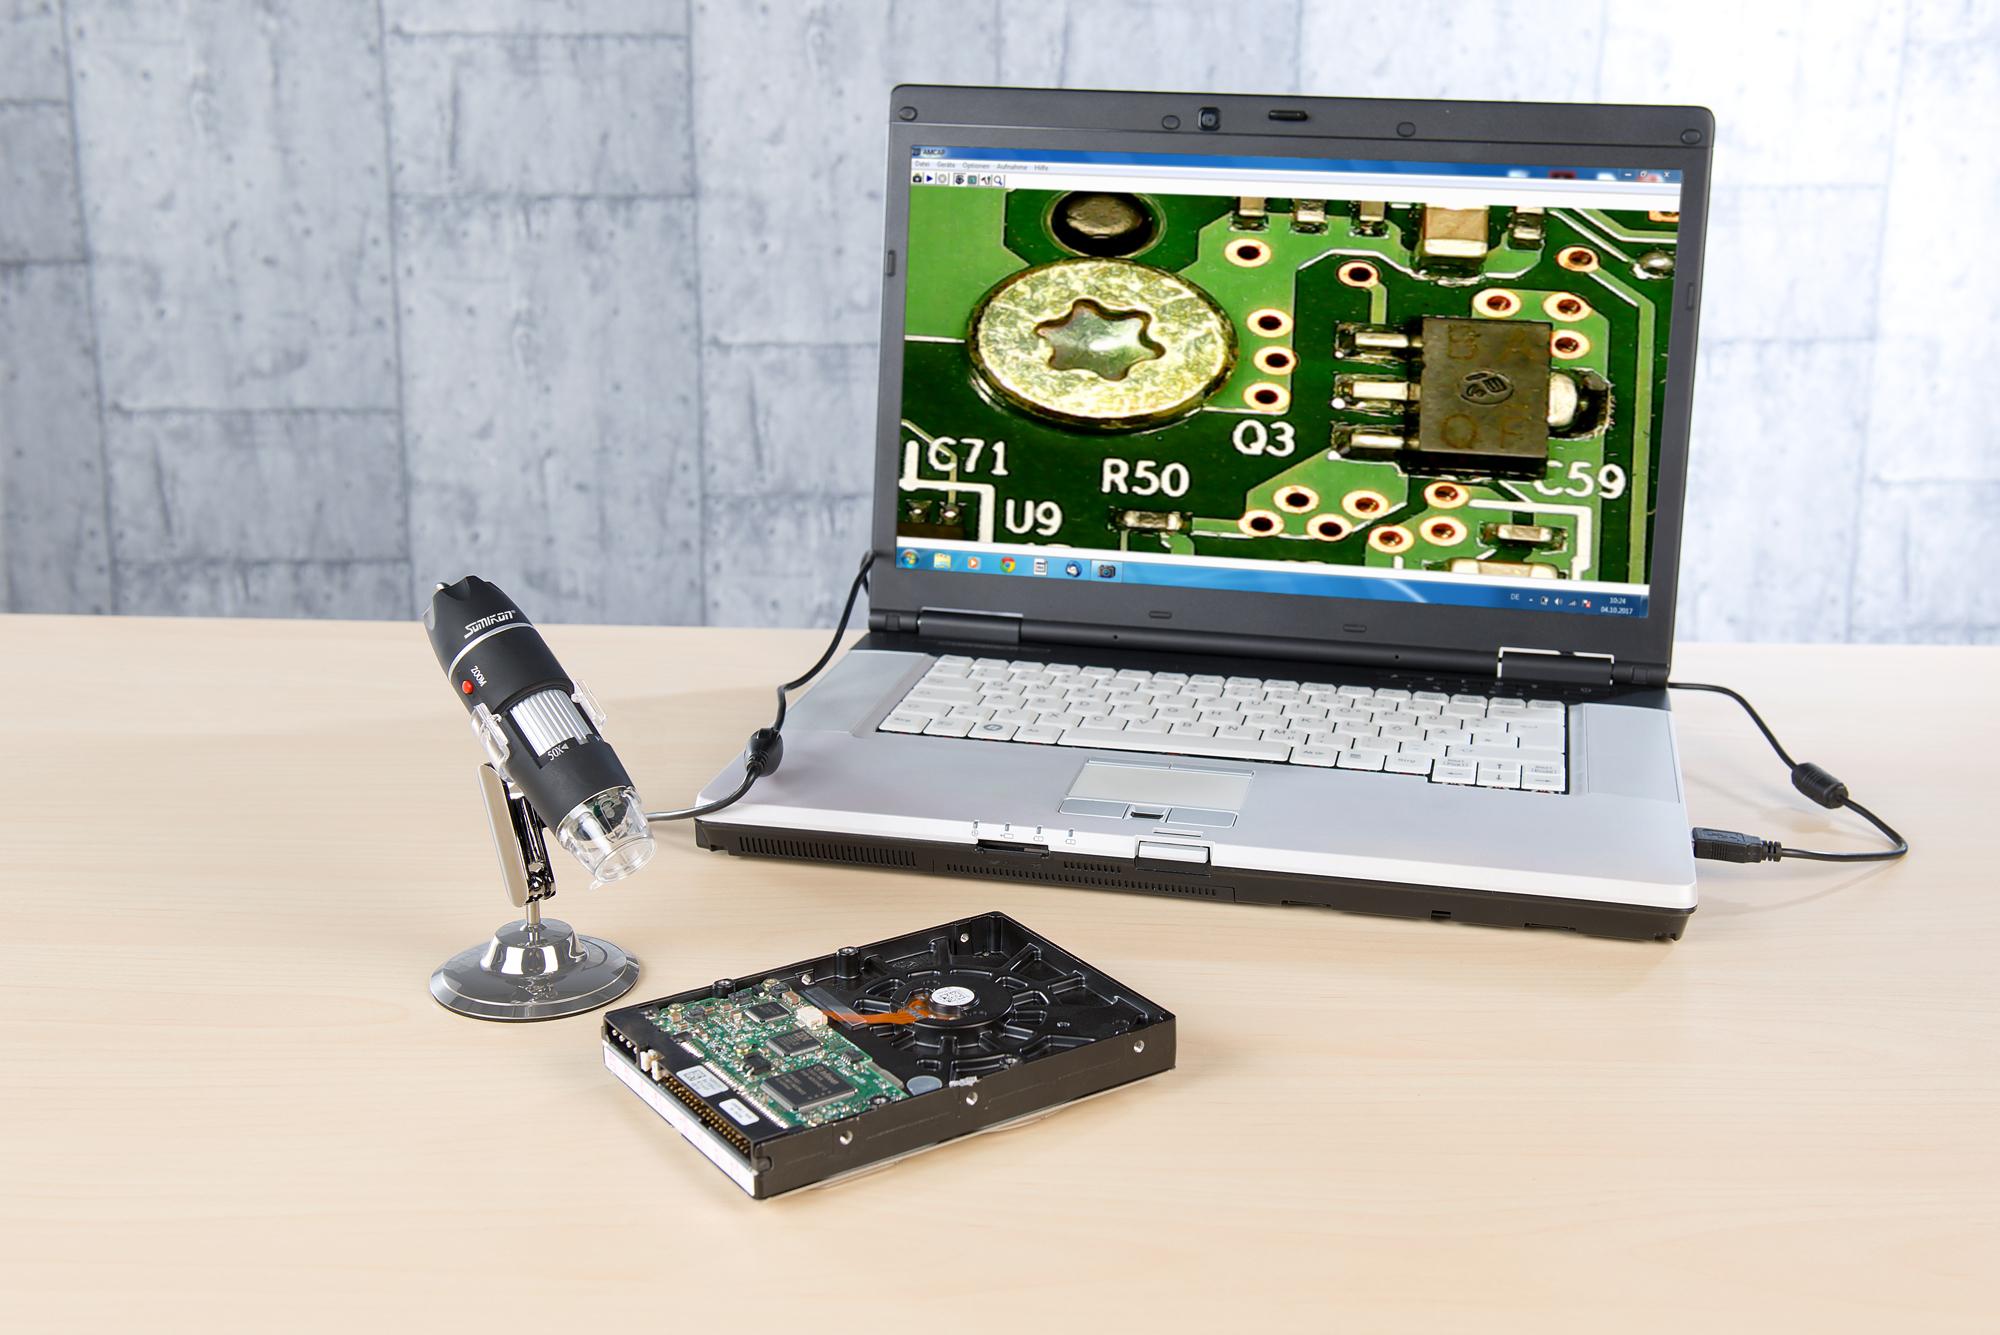 Usb mikroskop kamera somikon usb digital mikroskop kamera youtube